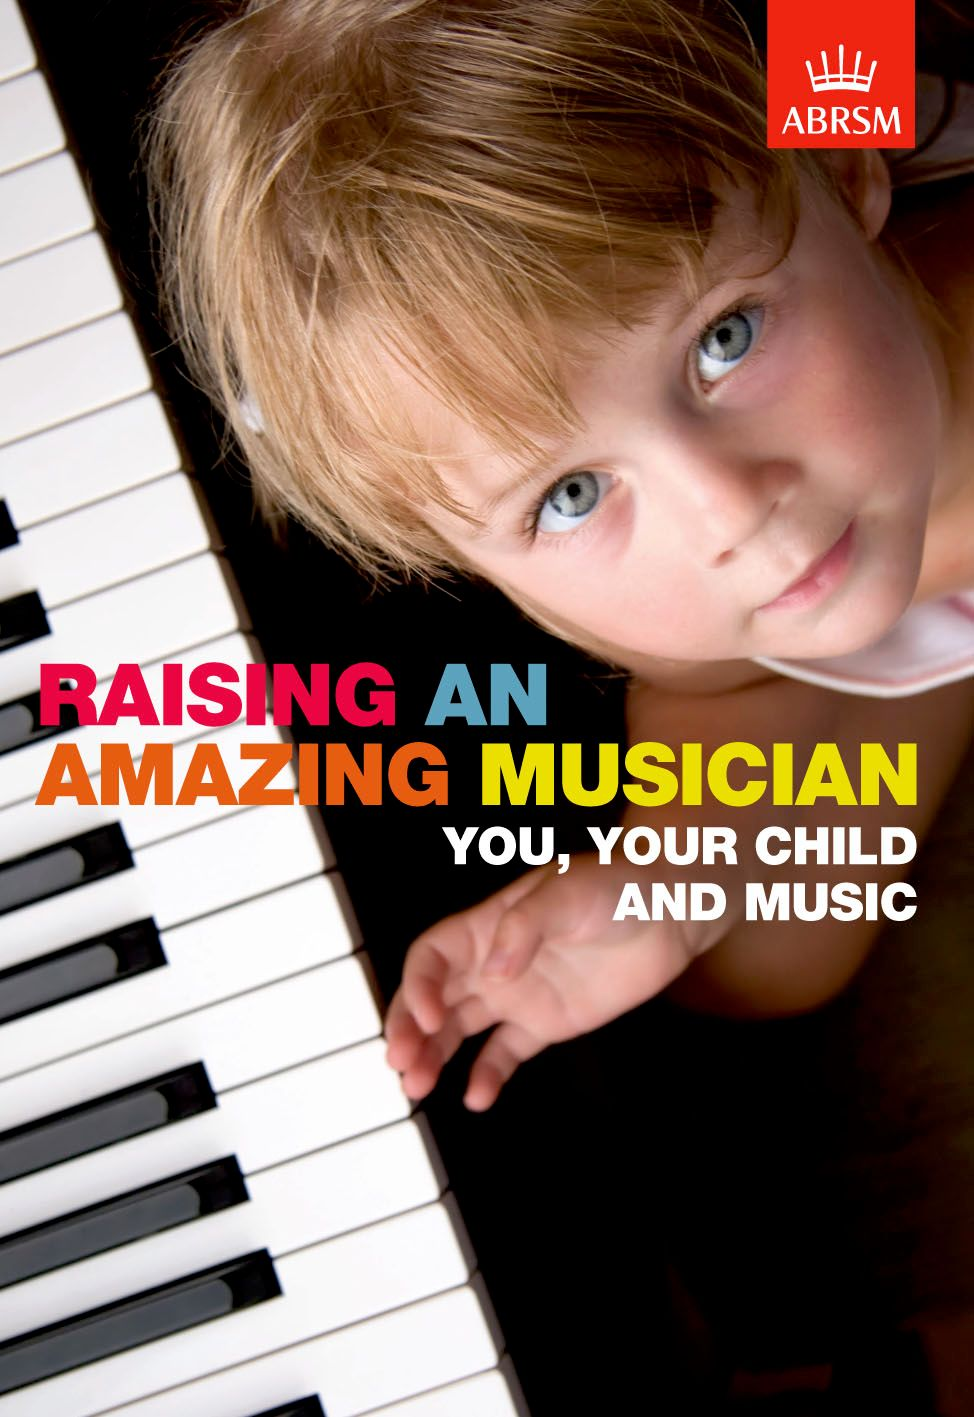 Raising an Amazing Musician